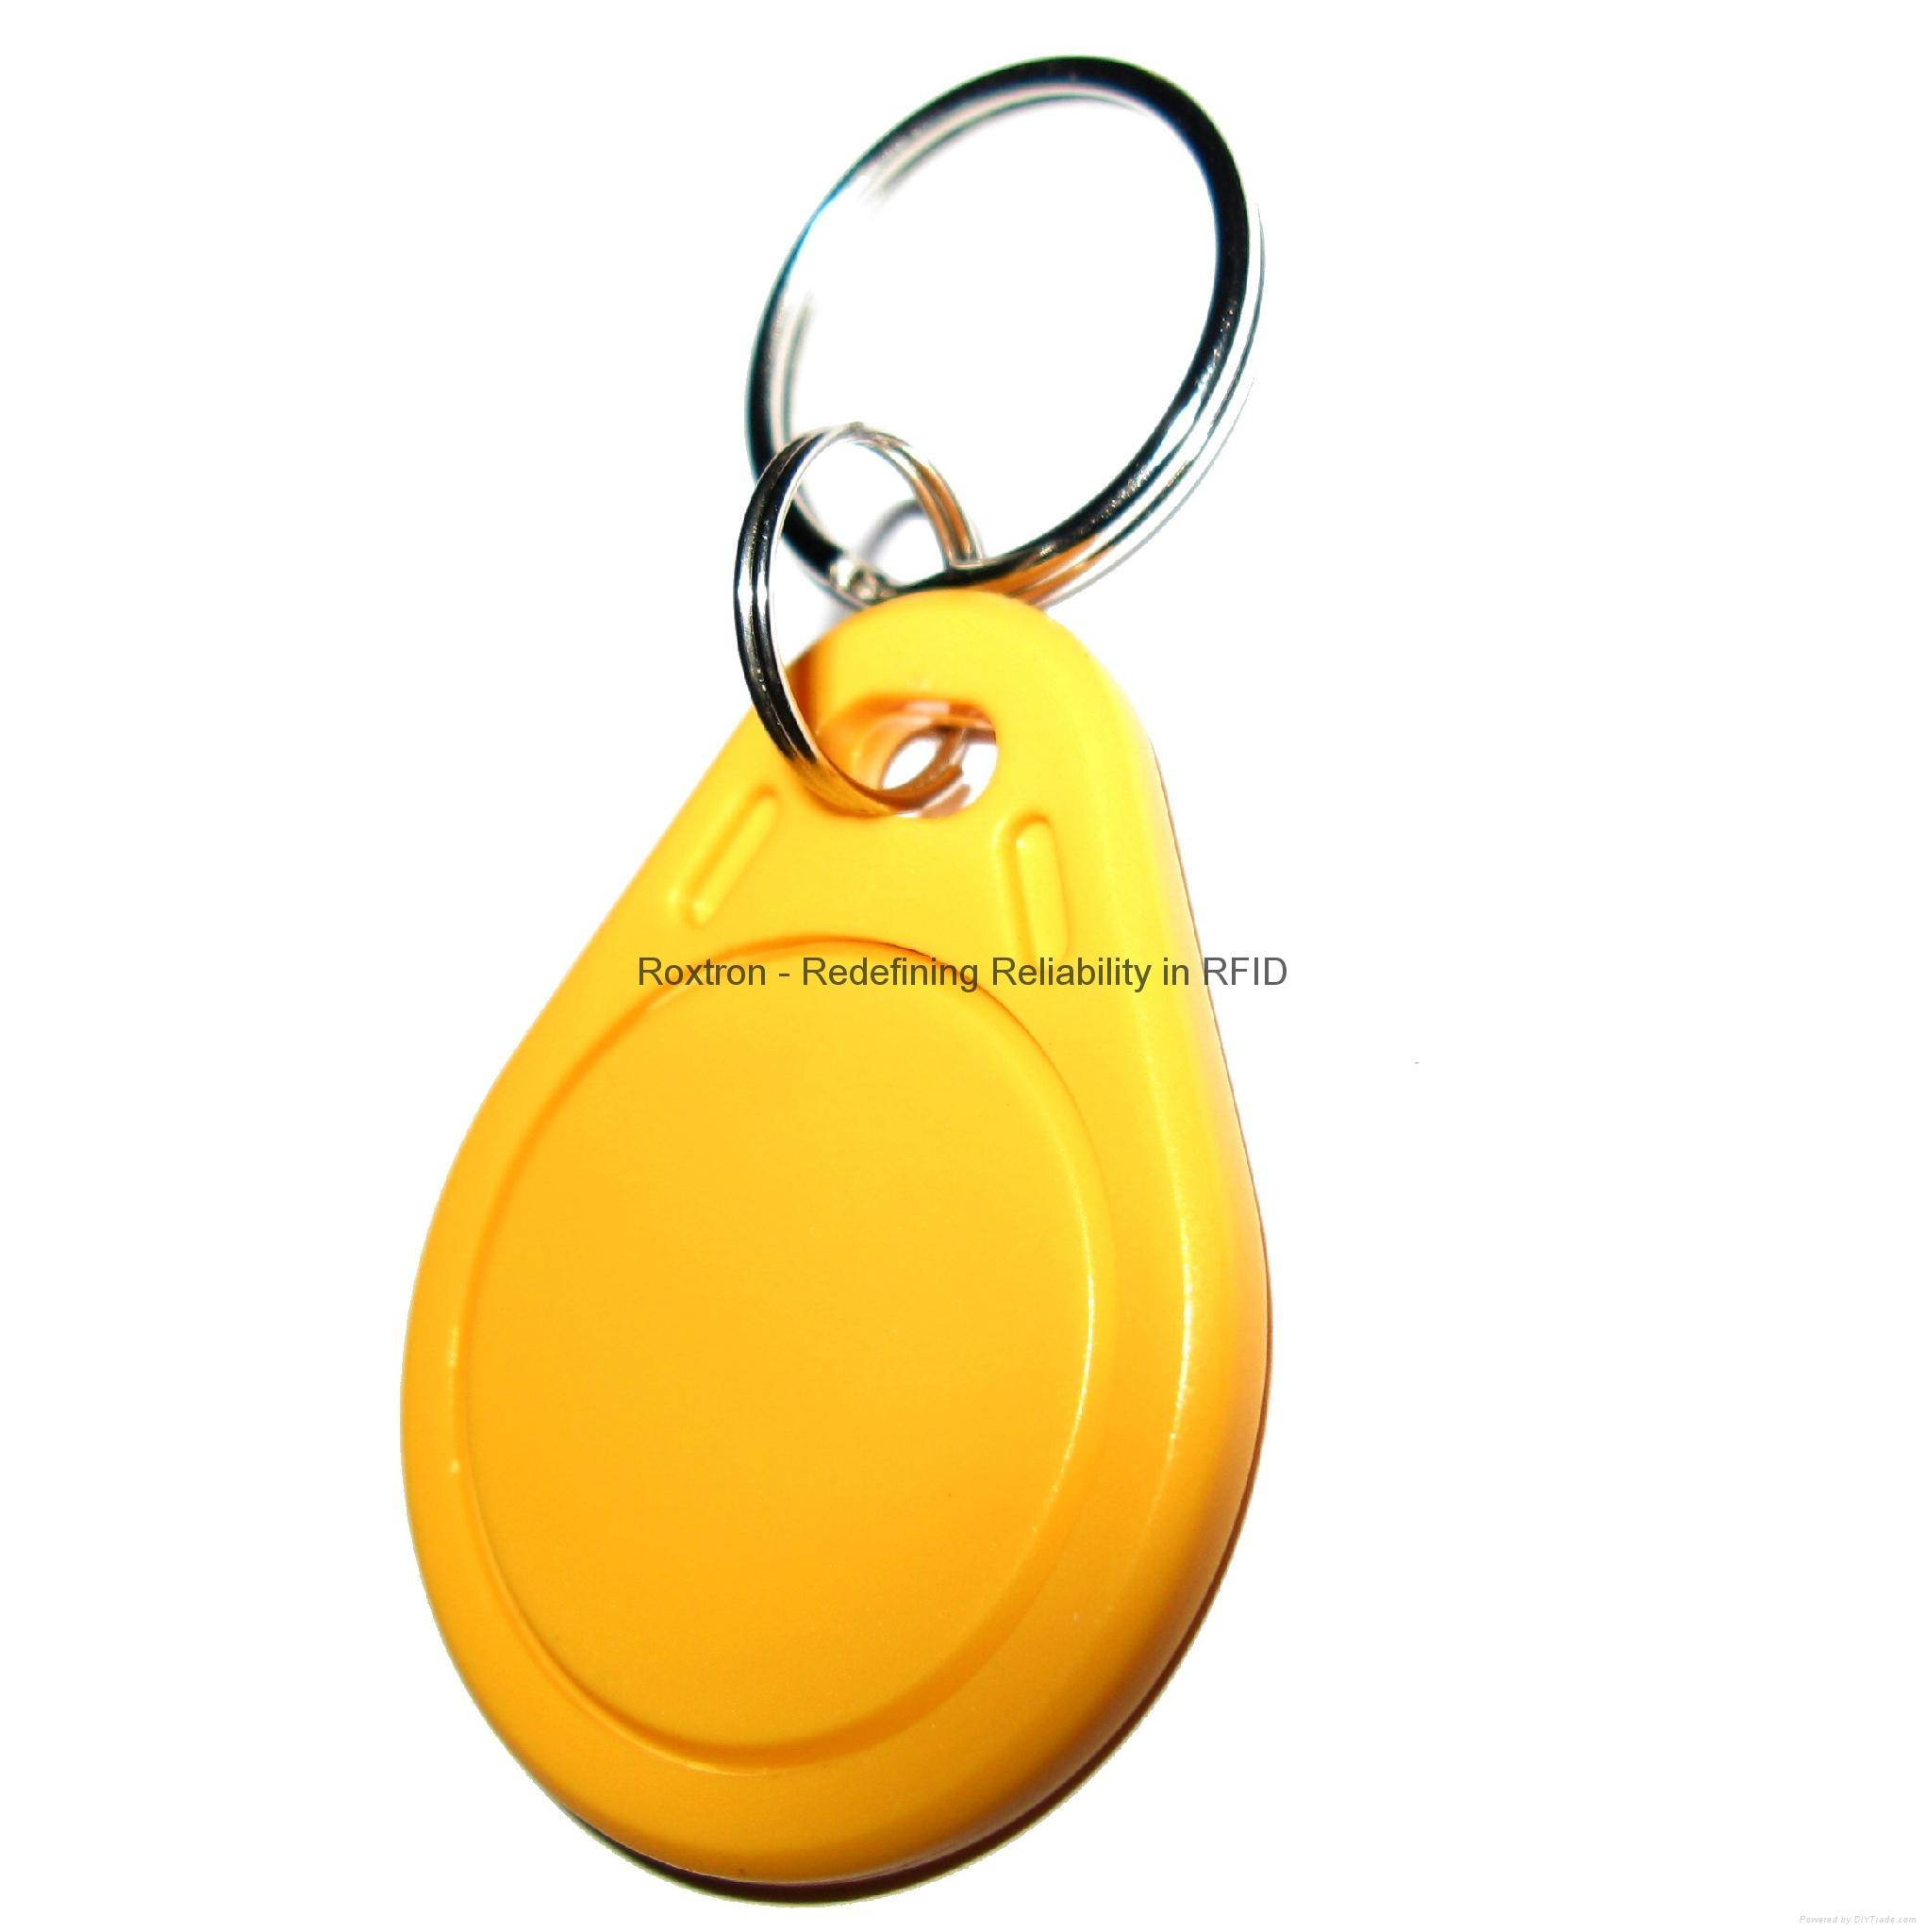 Hitag 2 RXK04 Key Tag 10